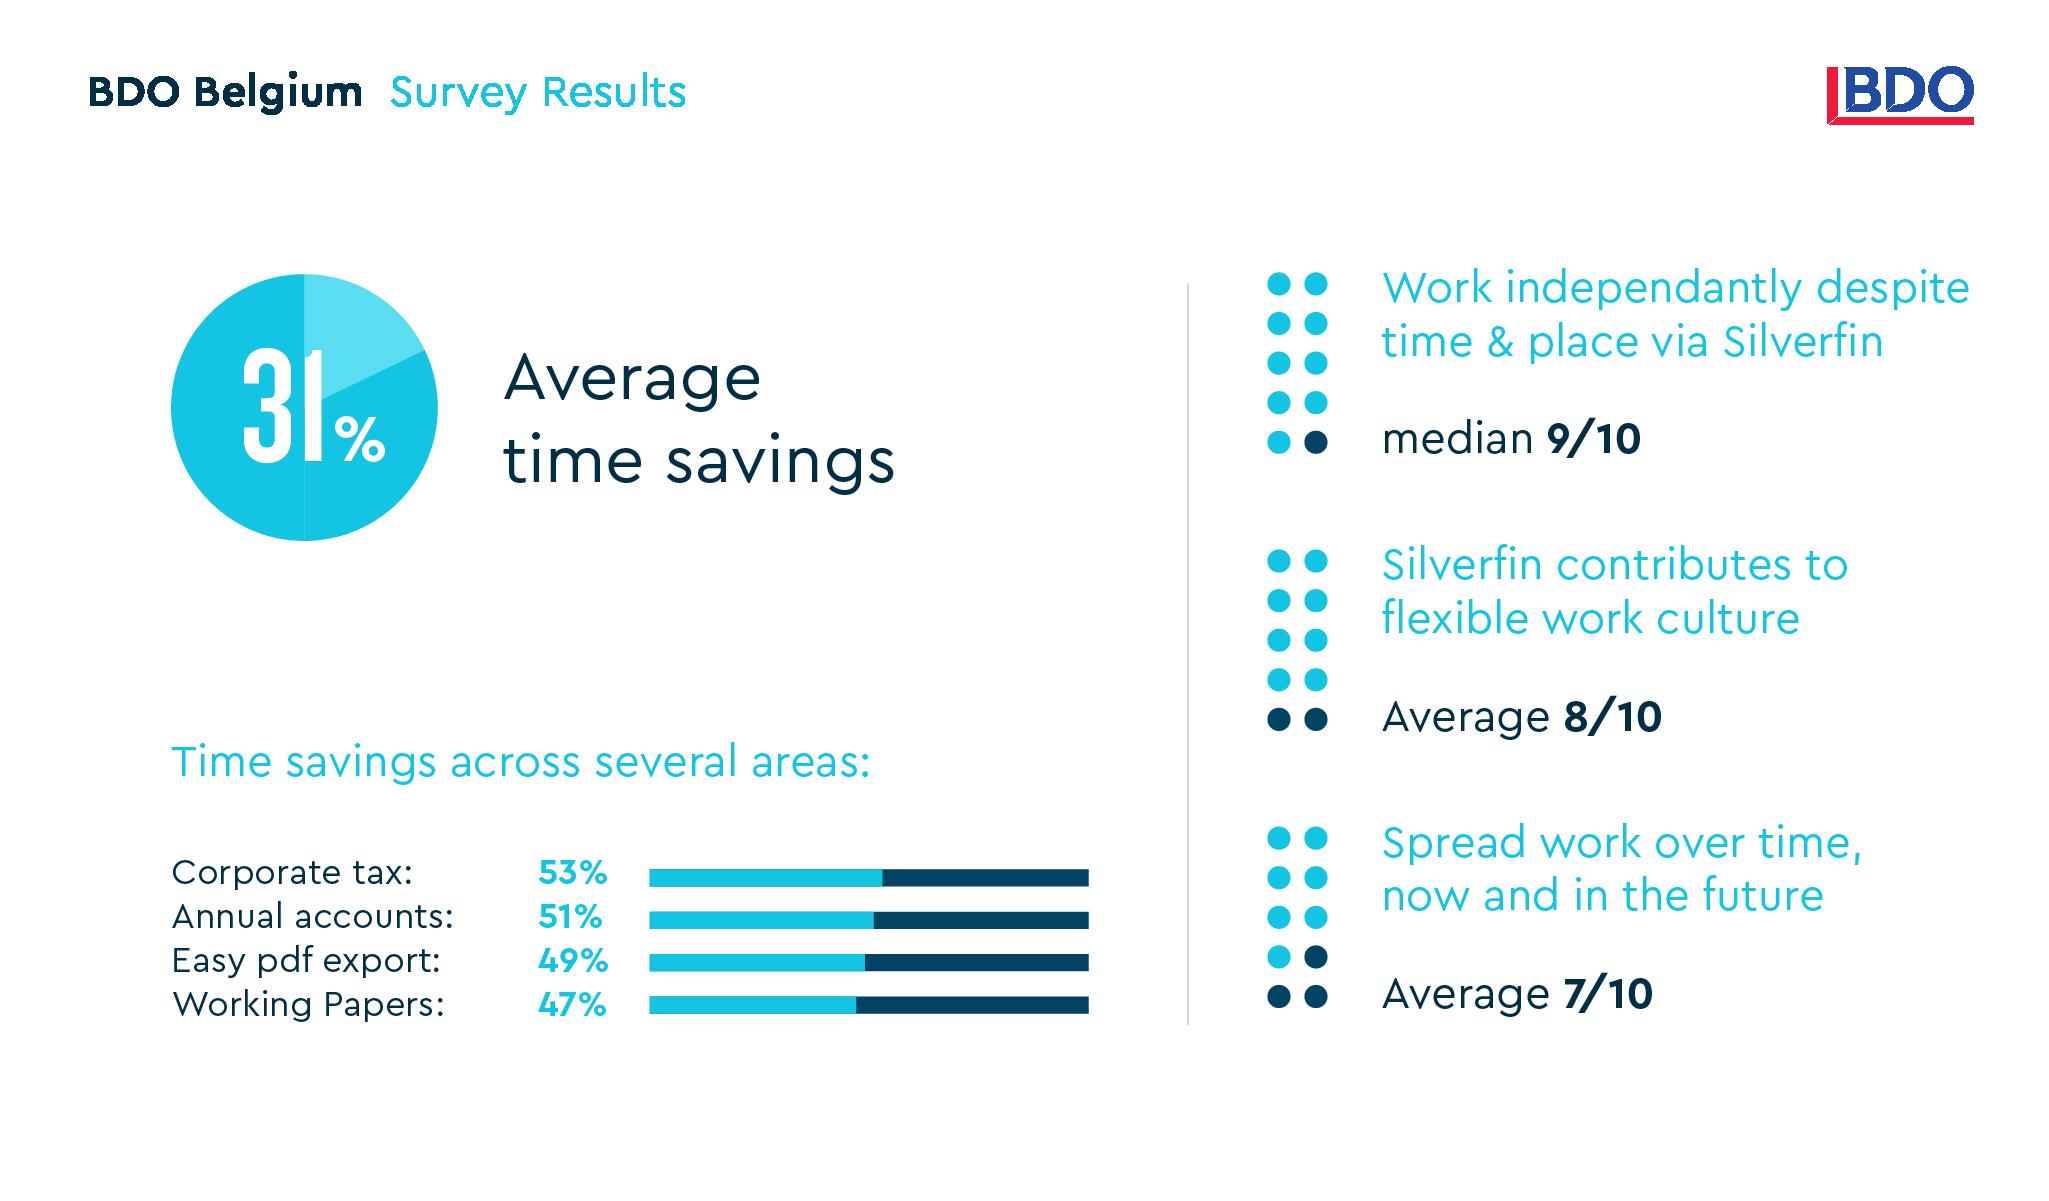 BDO_Survey_Results_EN_V2.2@2x